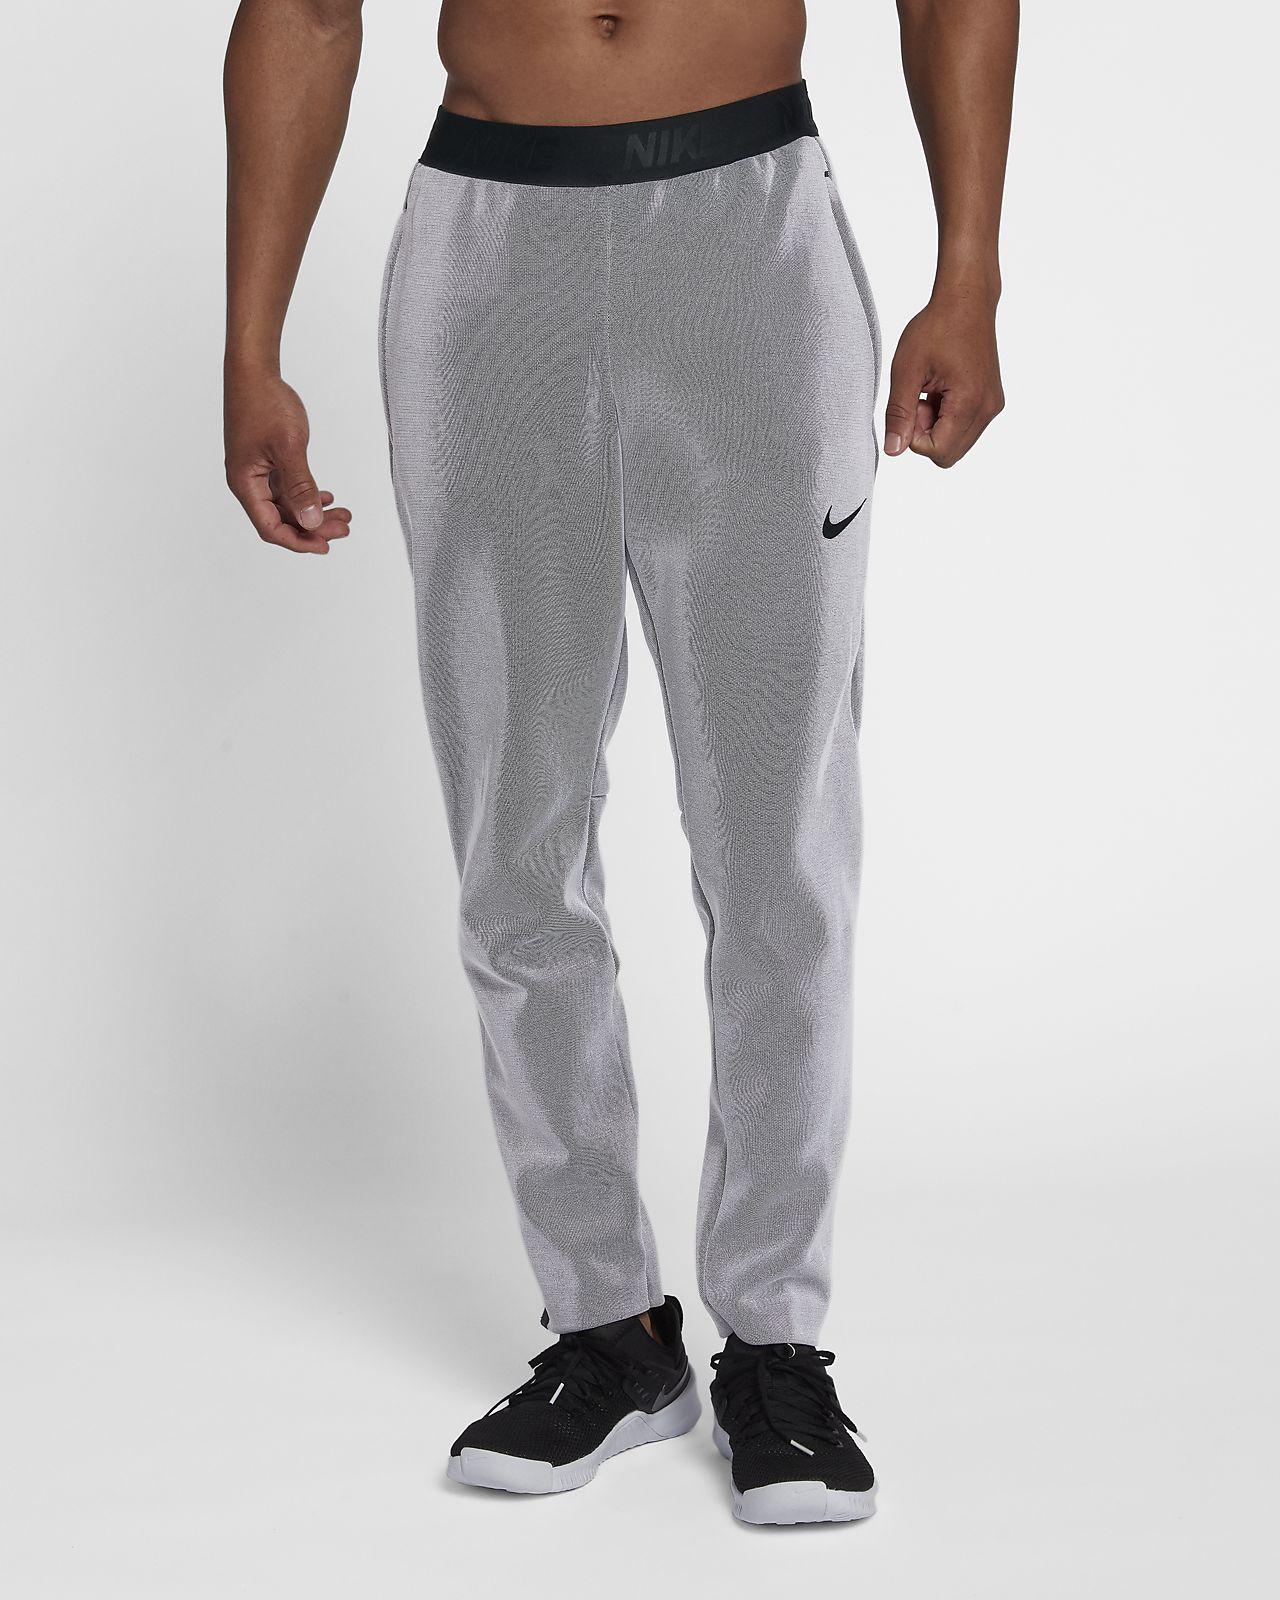 Pantalon de training Nike Therma Sphere Max pour Homme